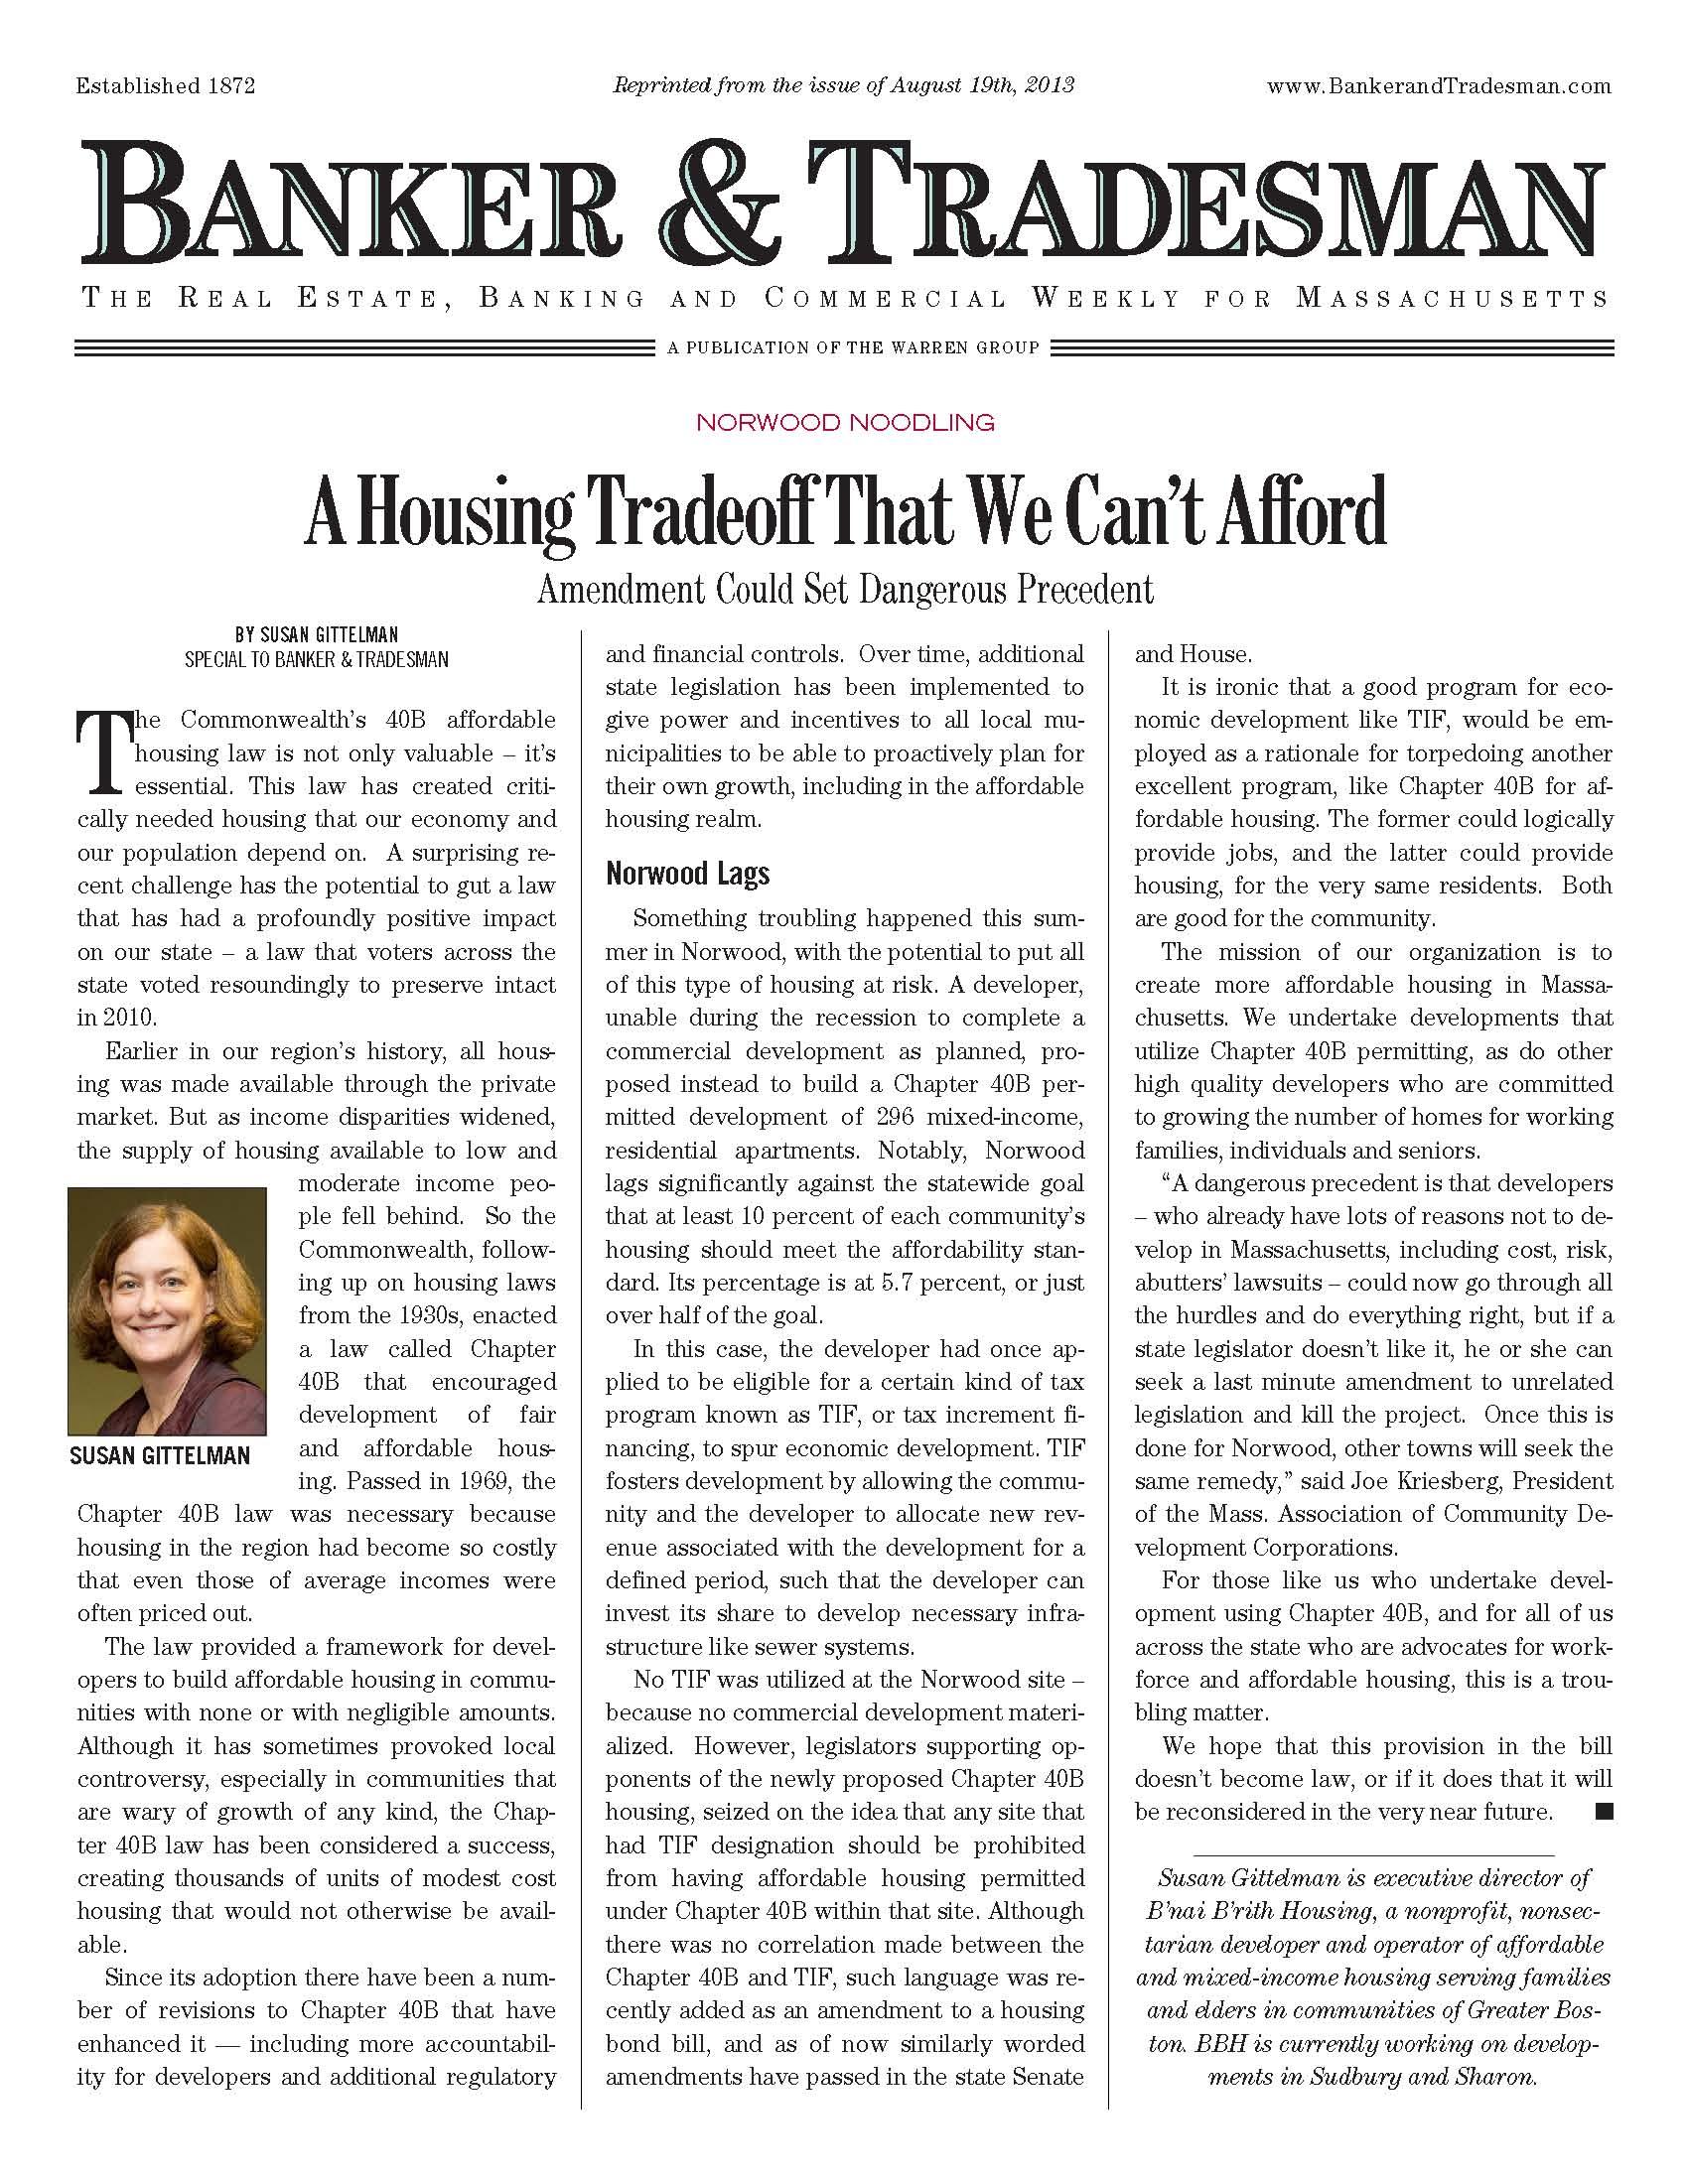 Image of Banker & Tradesman column by B'nai B'rith Housing Executive Director Susan Gittleman: Housing Trade off That We Can't Afford